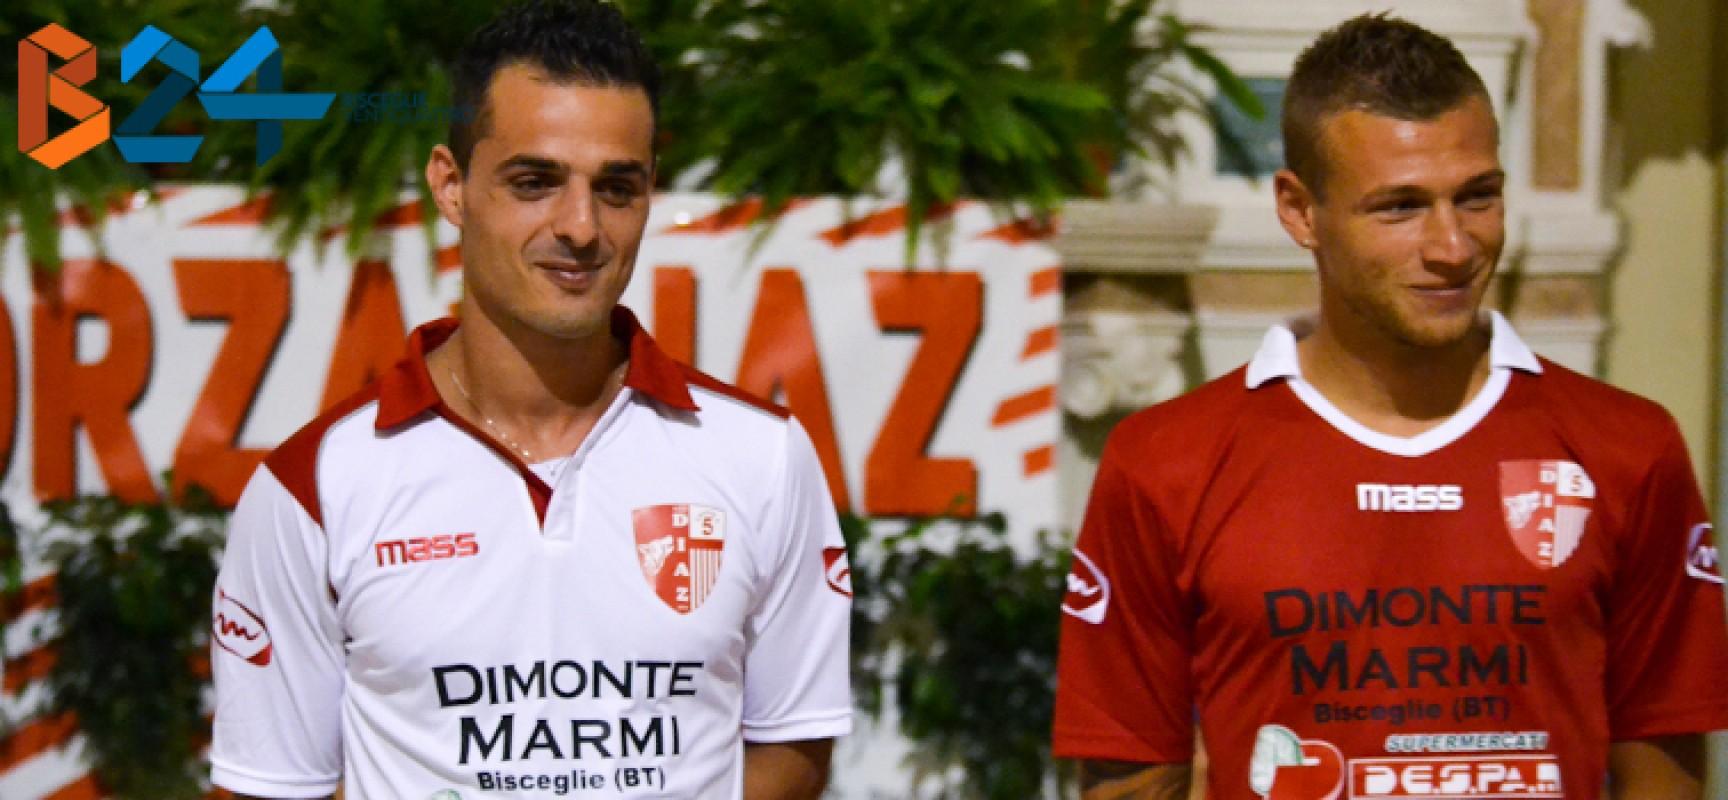 Impresa Diaz a Polignano, Santos batte Real Adelfia, Nettuno pesante sconfitta a Locorotondo / CLASSIFICA